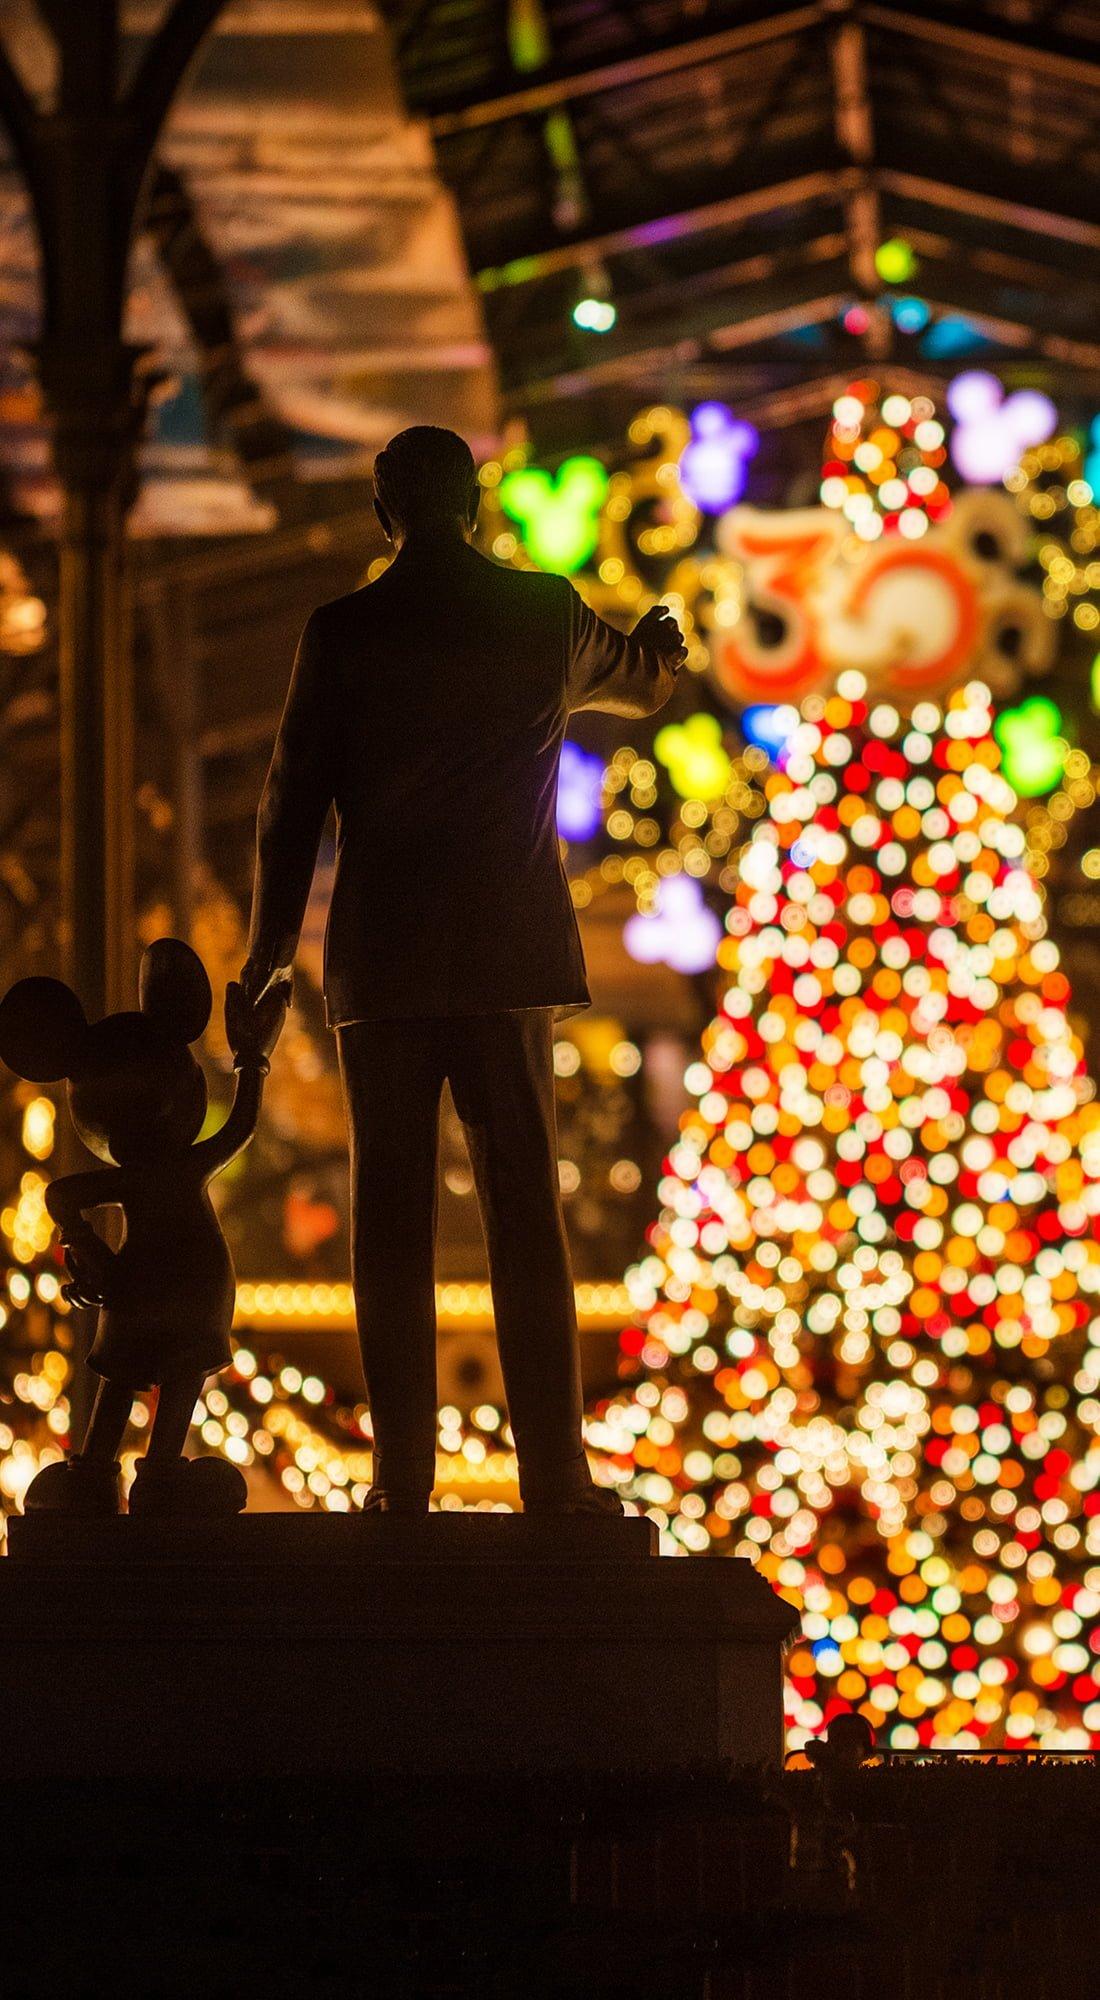 Wonderful Wallpaper Christmas Mickey Mouse - walt-disney-mickey-mouse-christmas-trees-phone-wallpaper  Trends_346861 .jpg